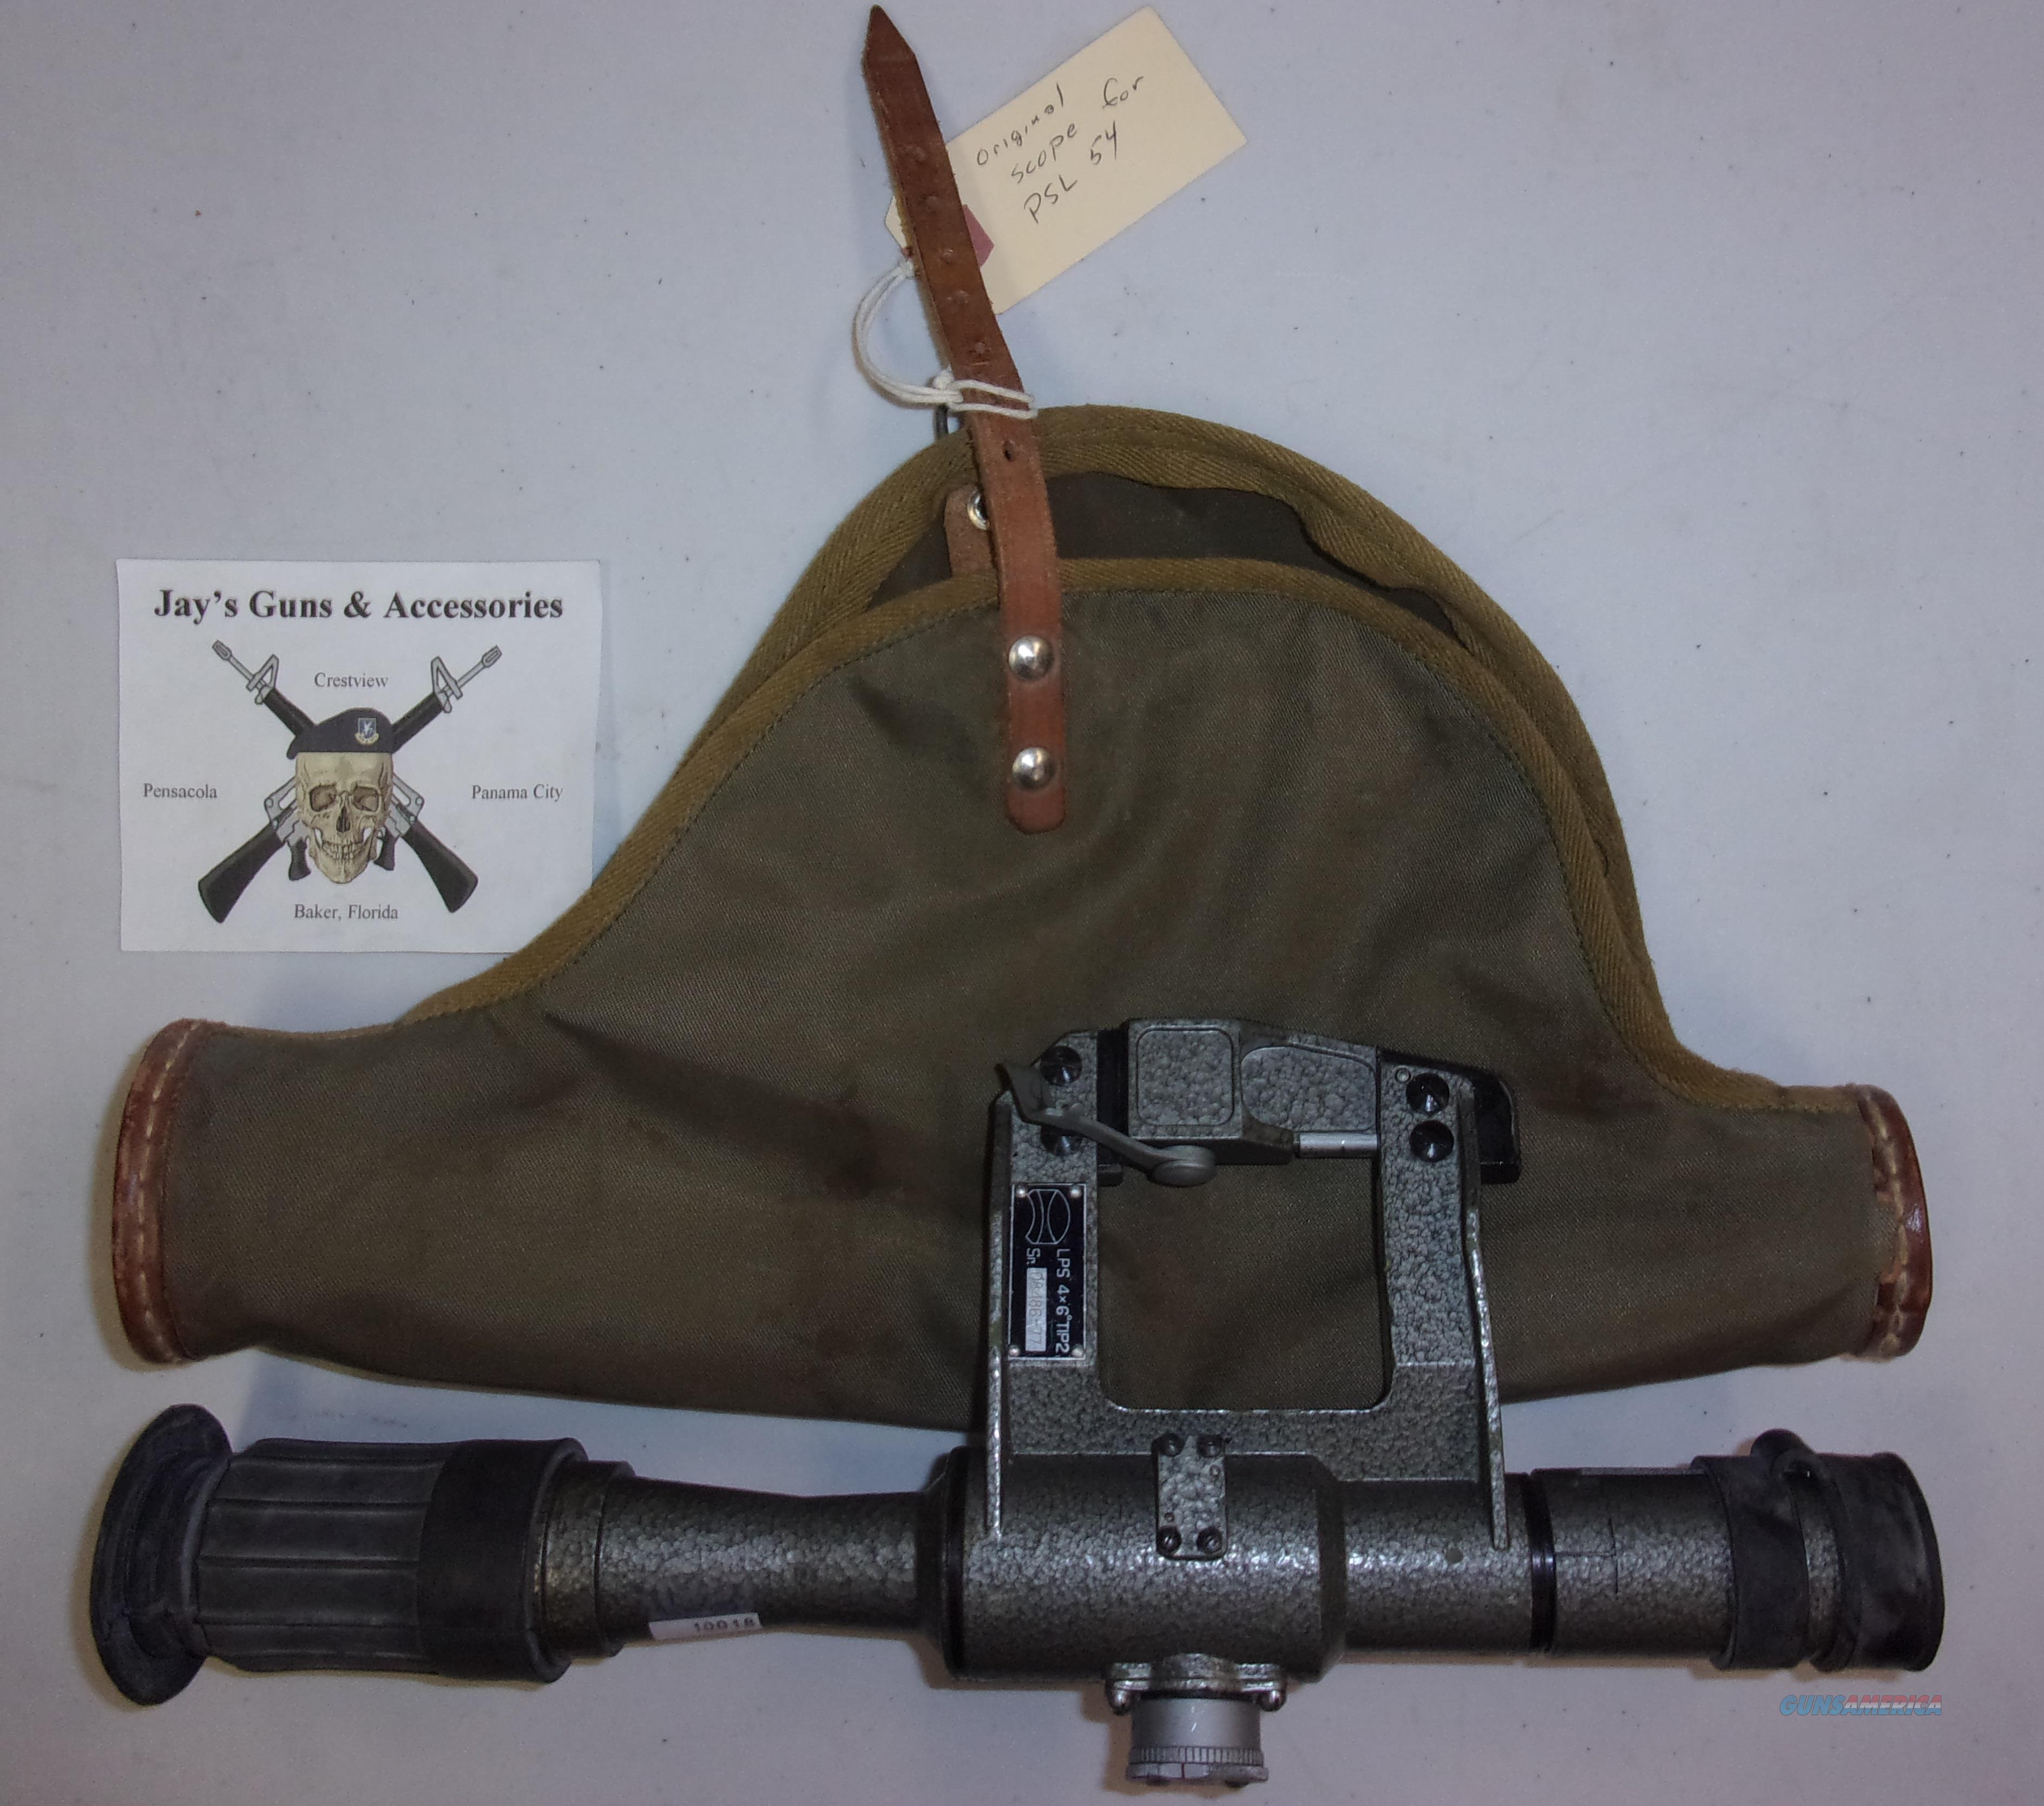 Original Scope for PSL 54  Non-Guns > Scopes/Mounts/Rings & Optics > Rifle Scopes > Fixed Focal Length